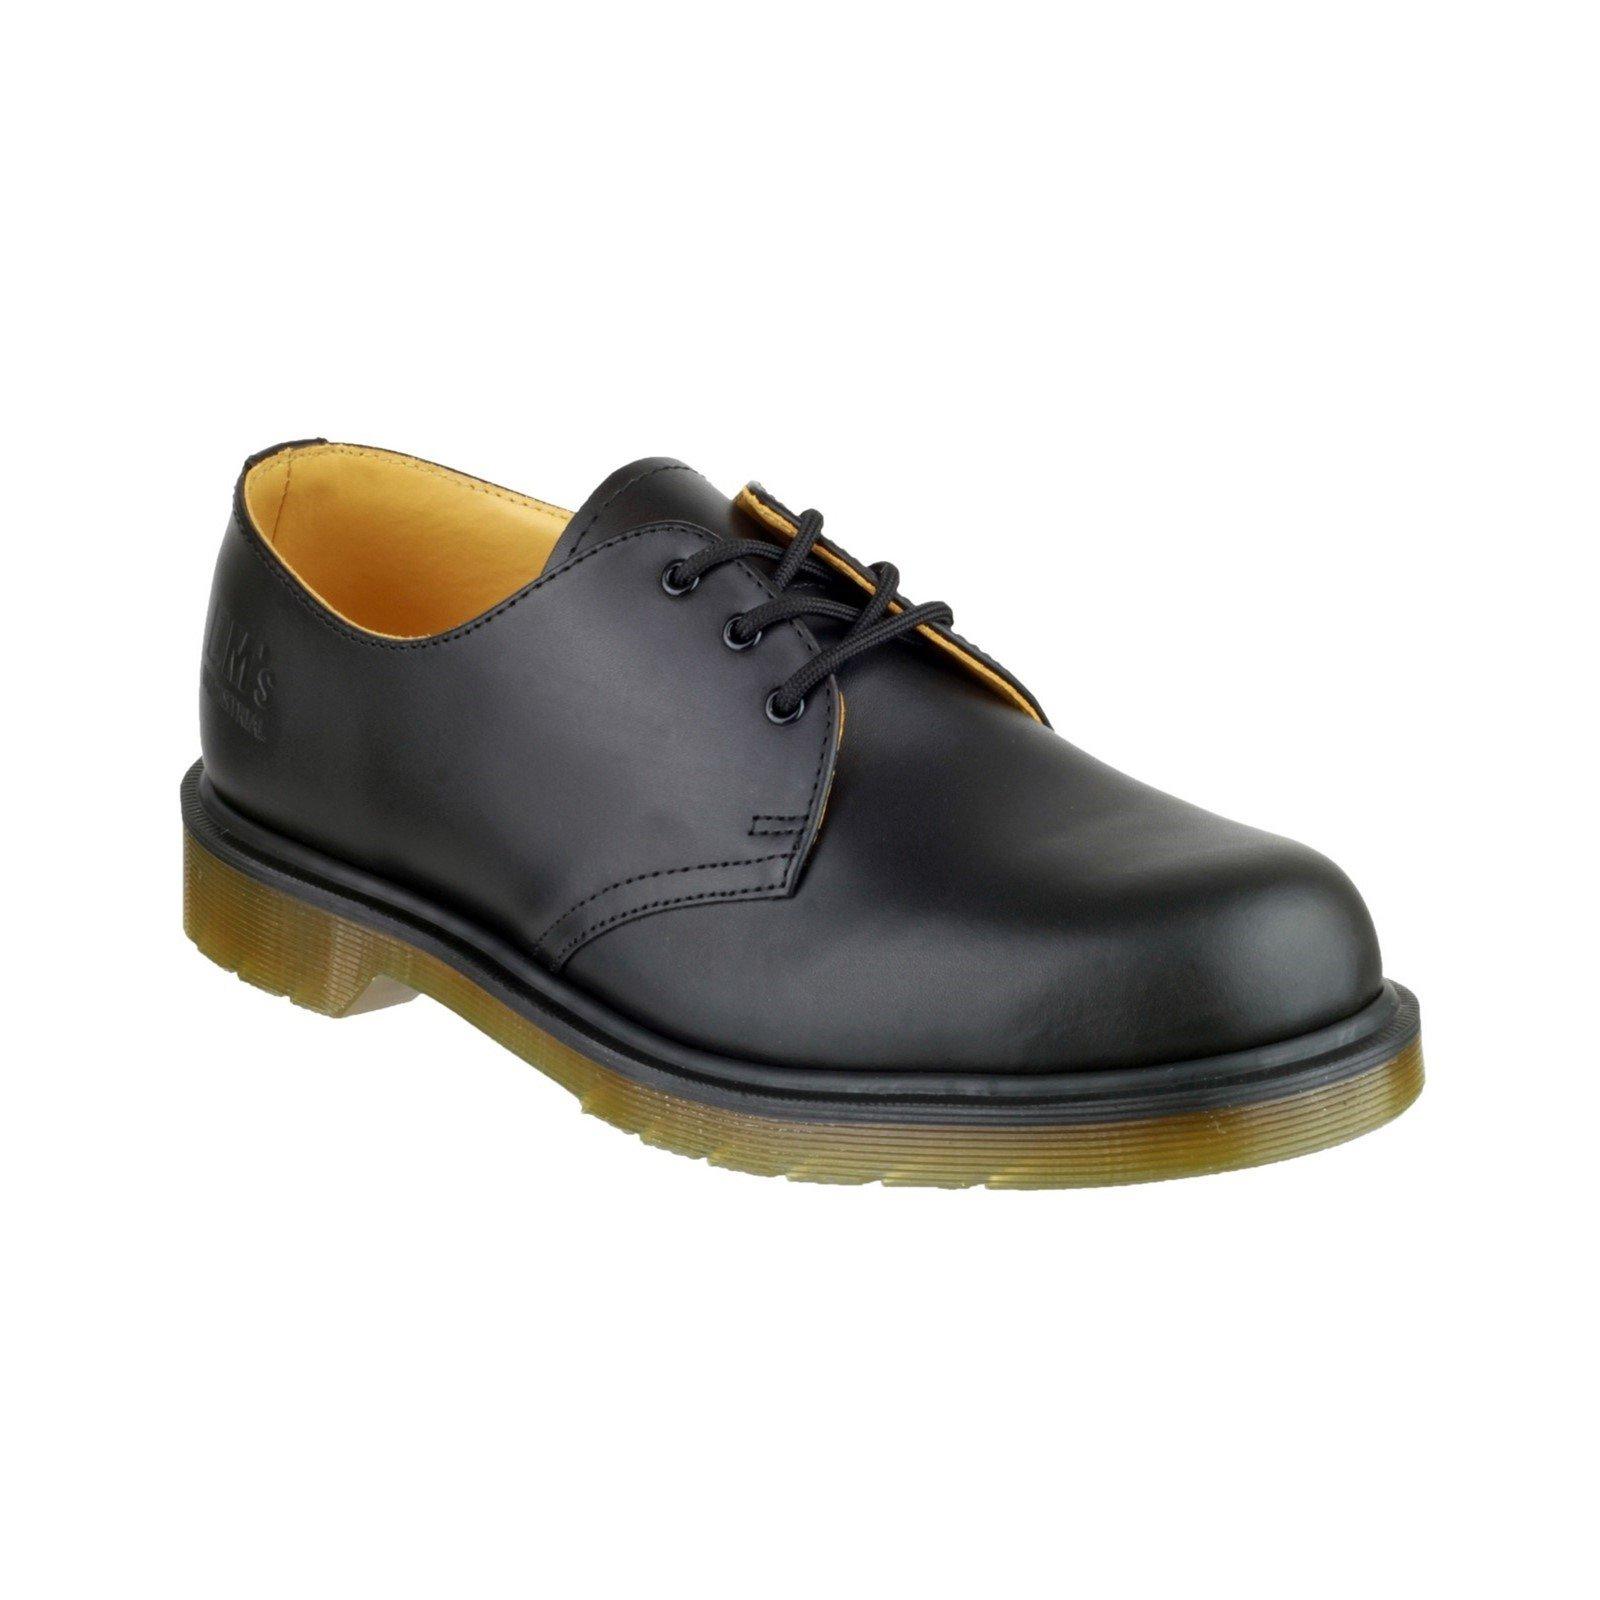 Dr Martens Men's Lace-Up Leather Derby Shoe Black 04915 - Black 12